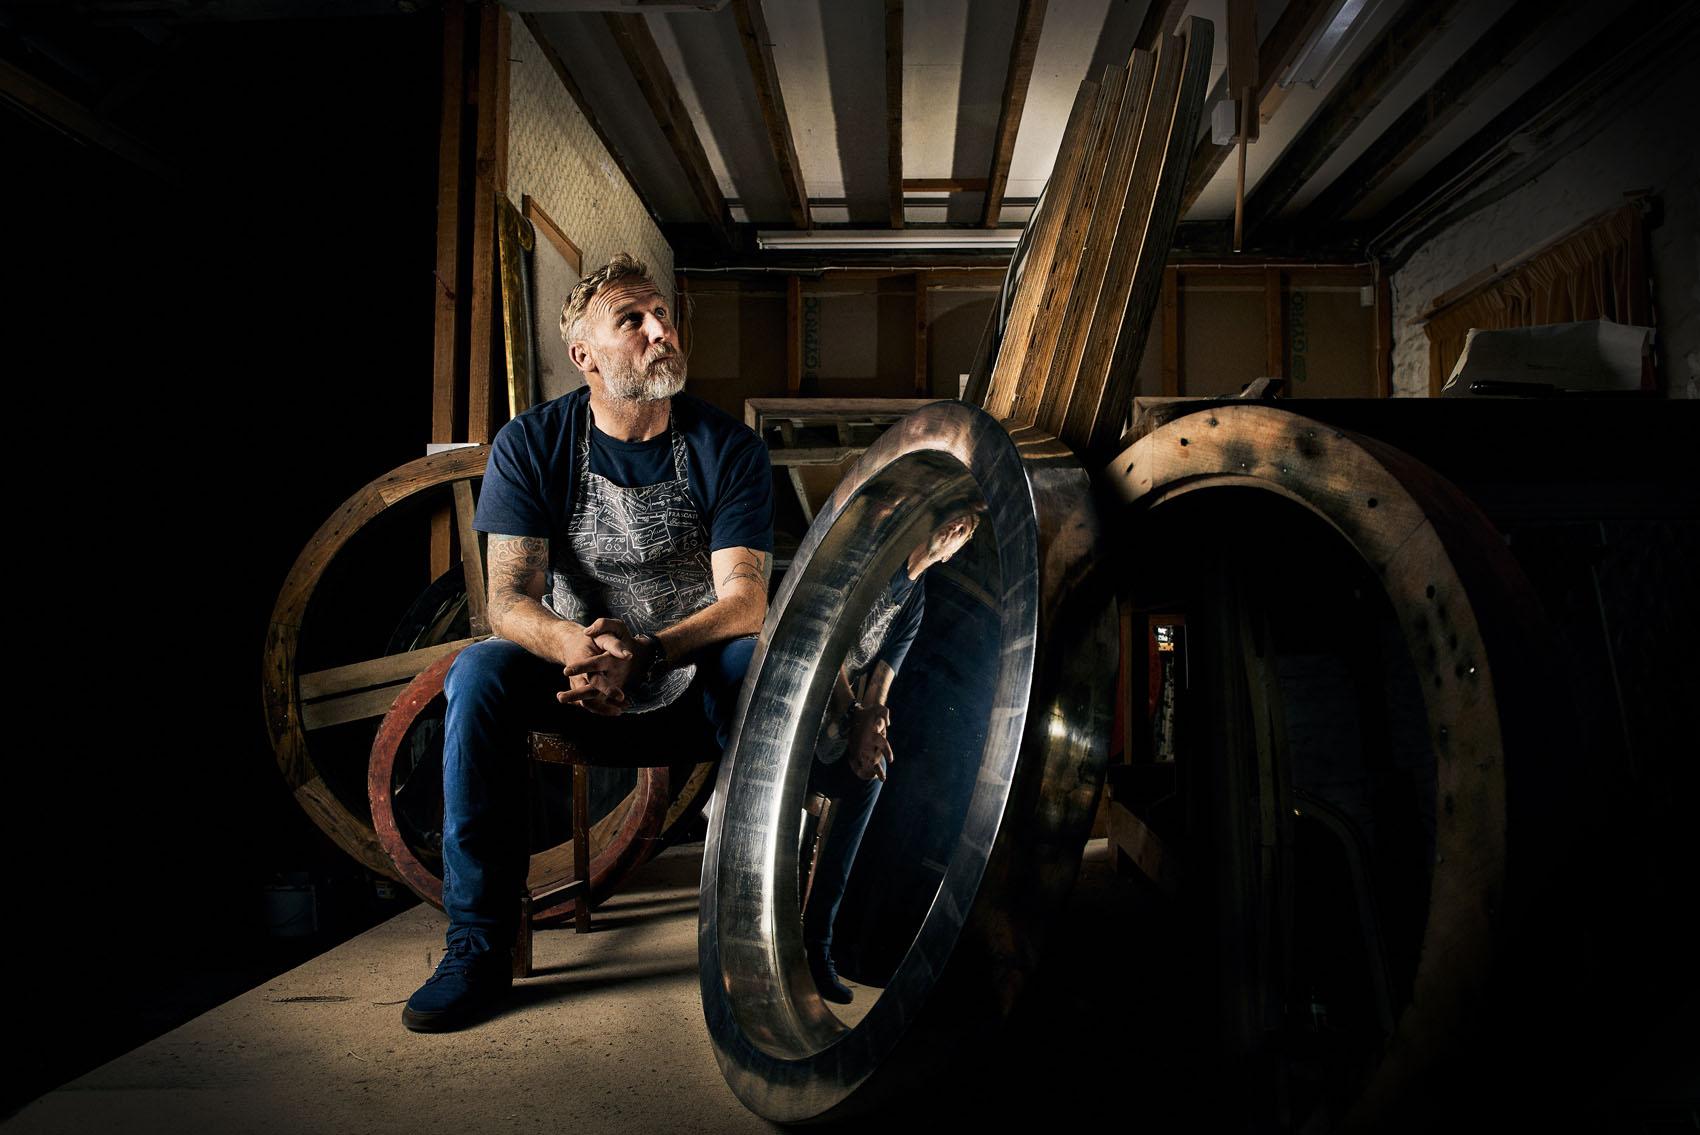 Sean Phelan in his gilding workshop